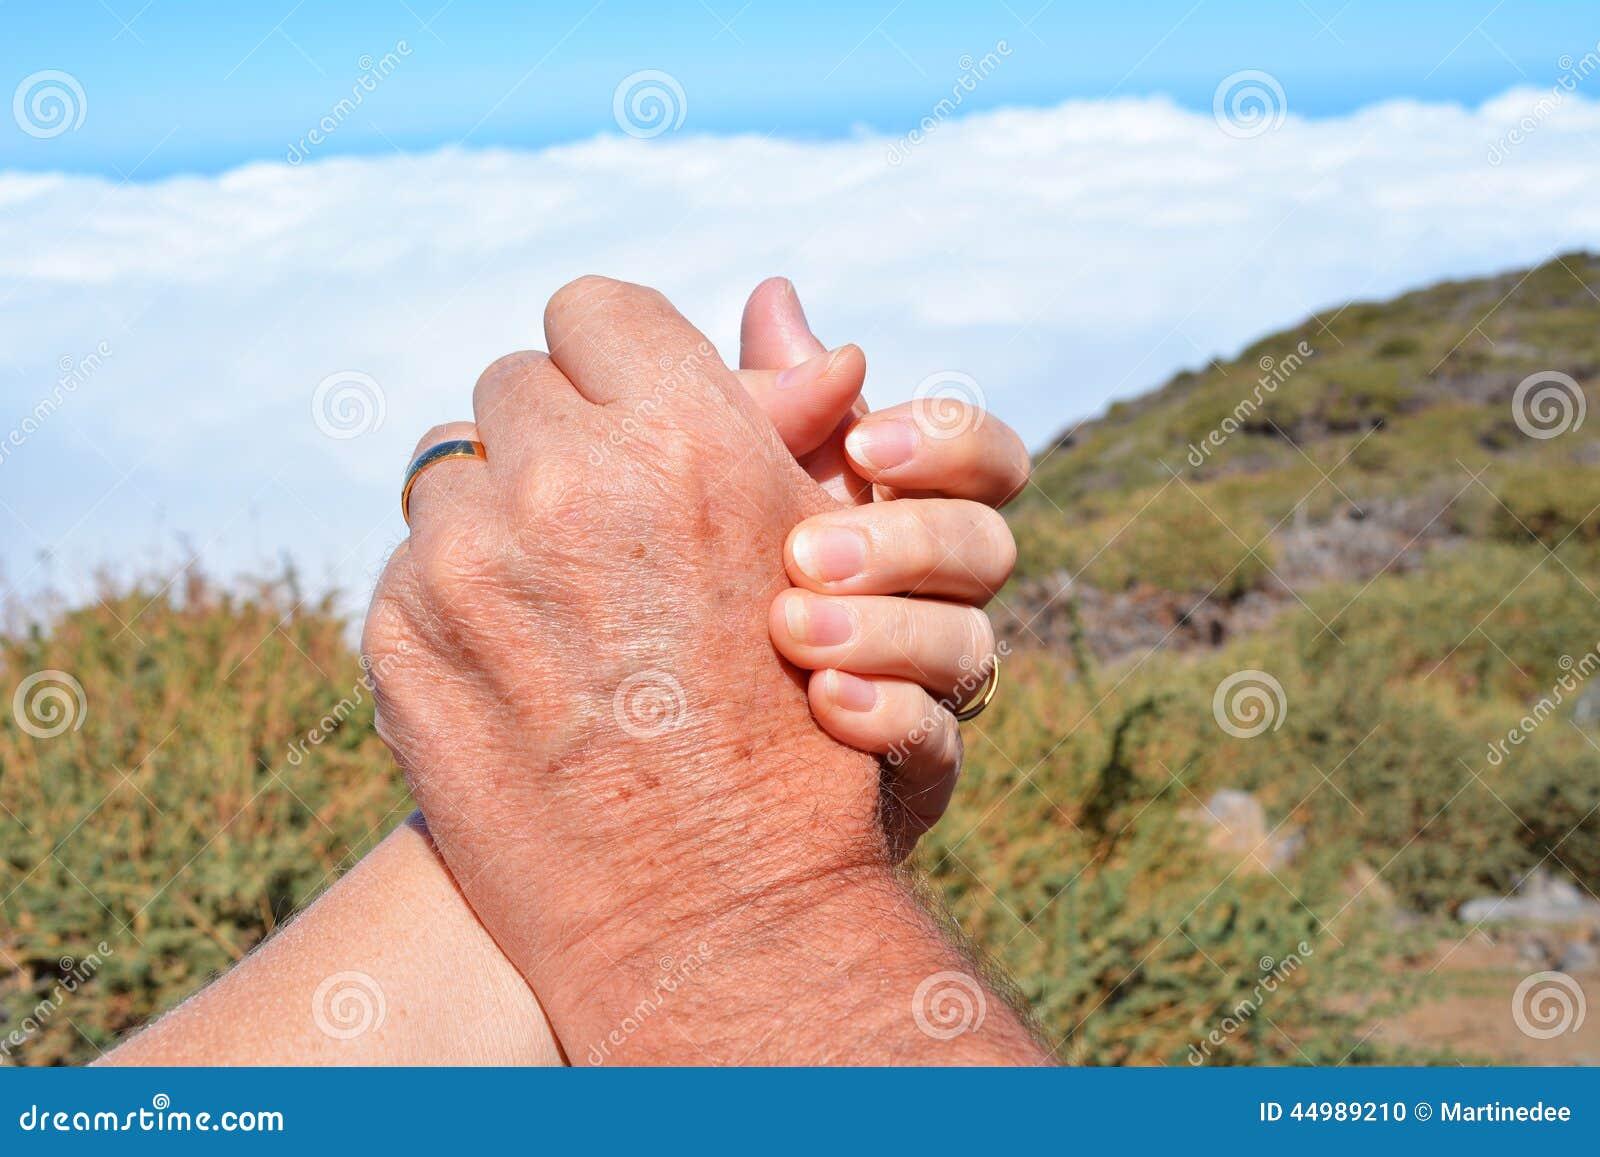 в руках два члена - 6